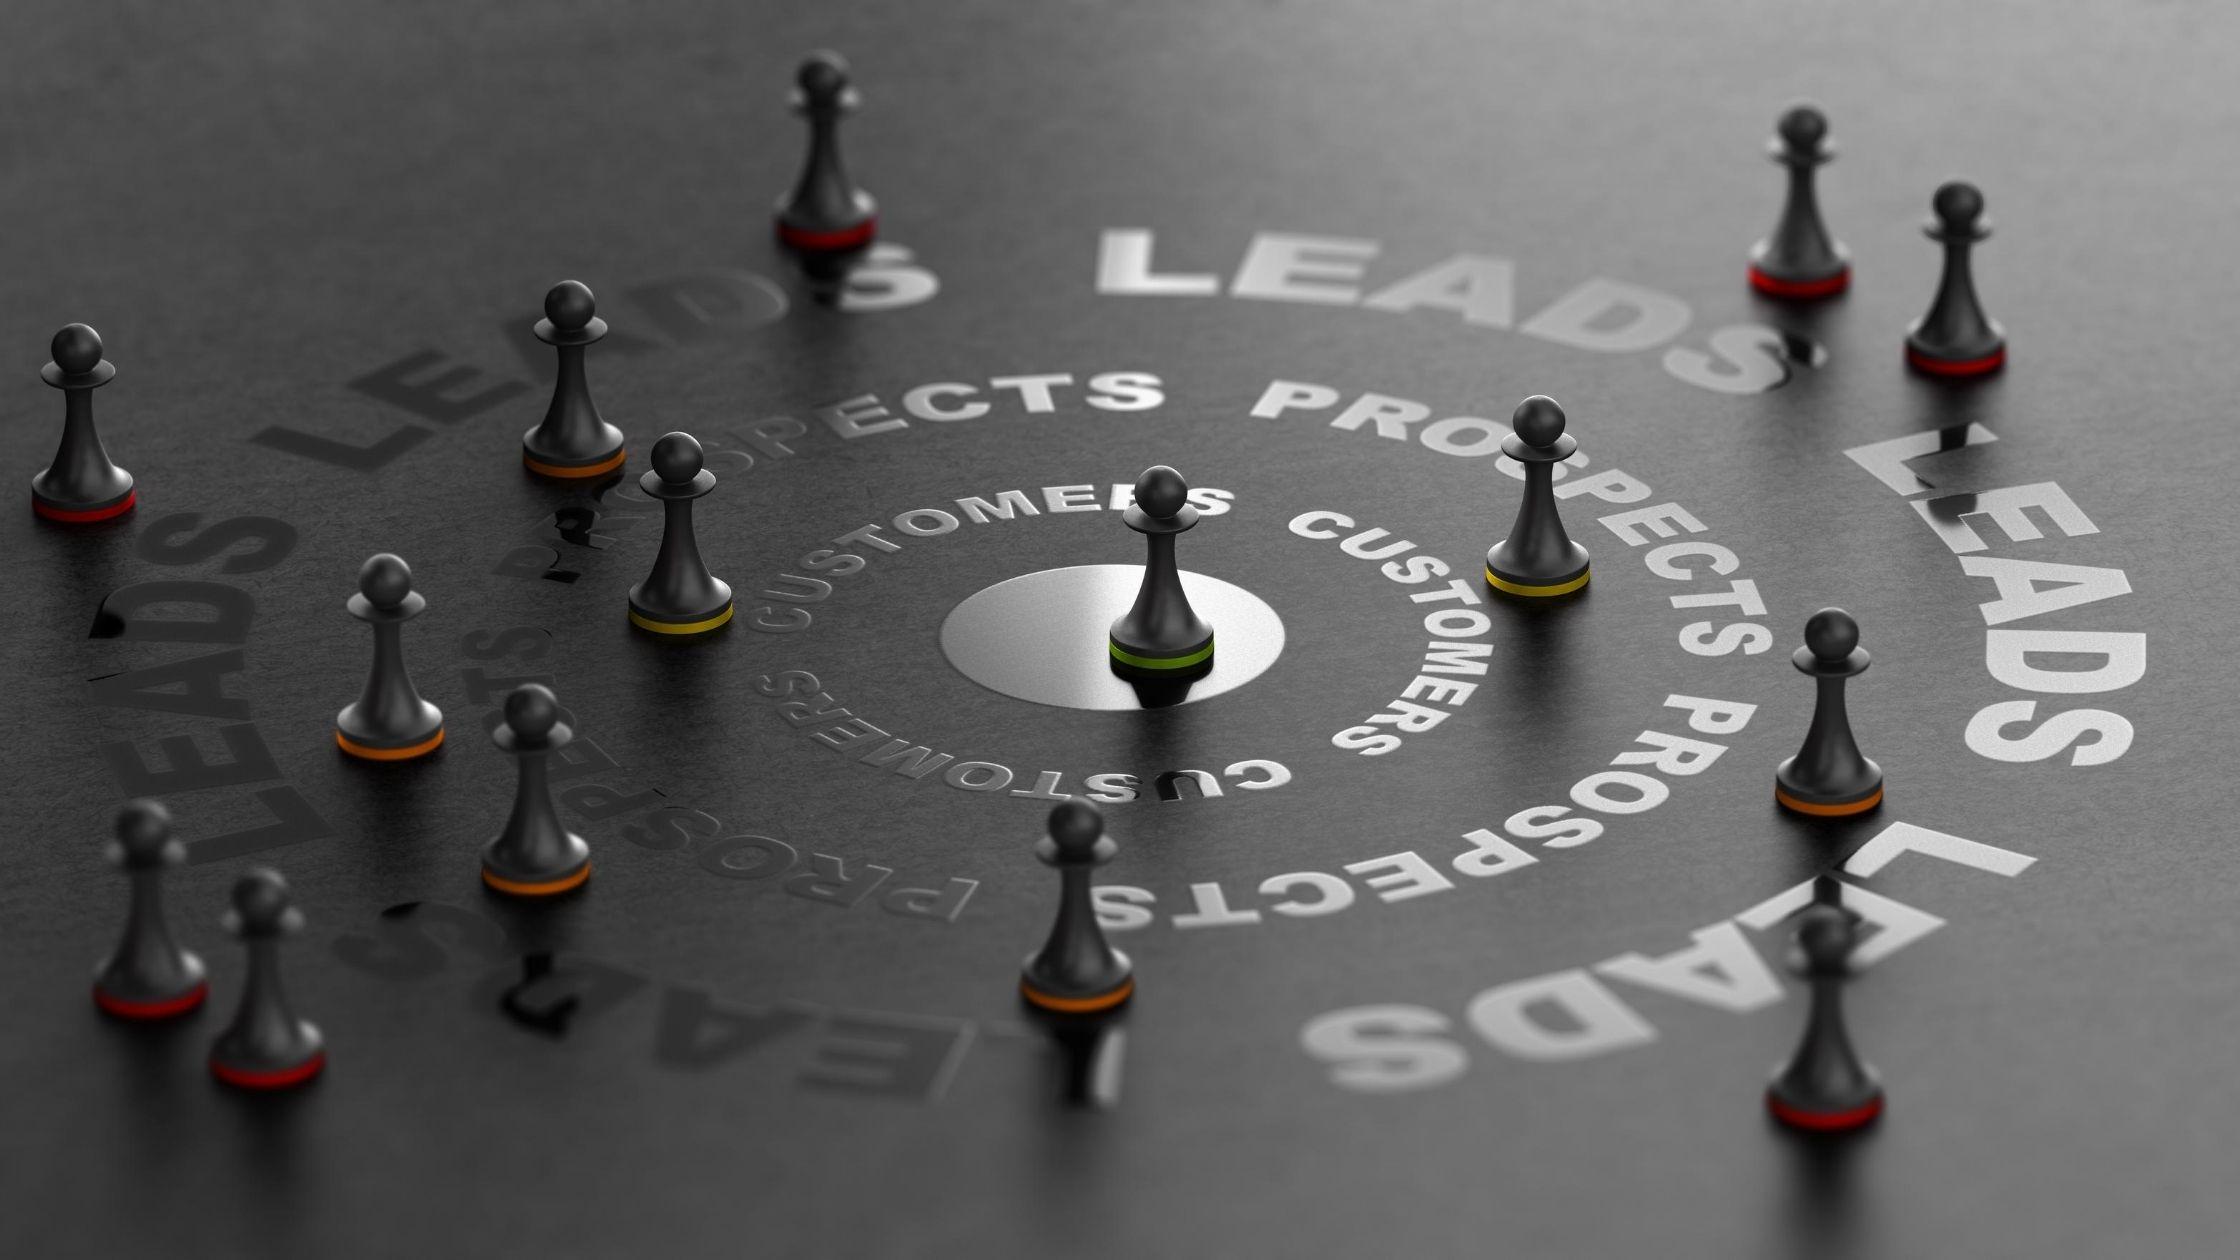 Top Lead Generation Strategies For Digital Marketers In 2021